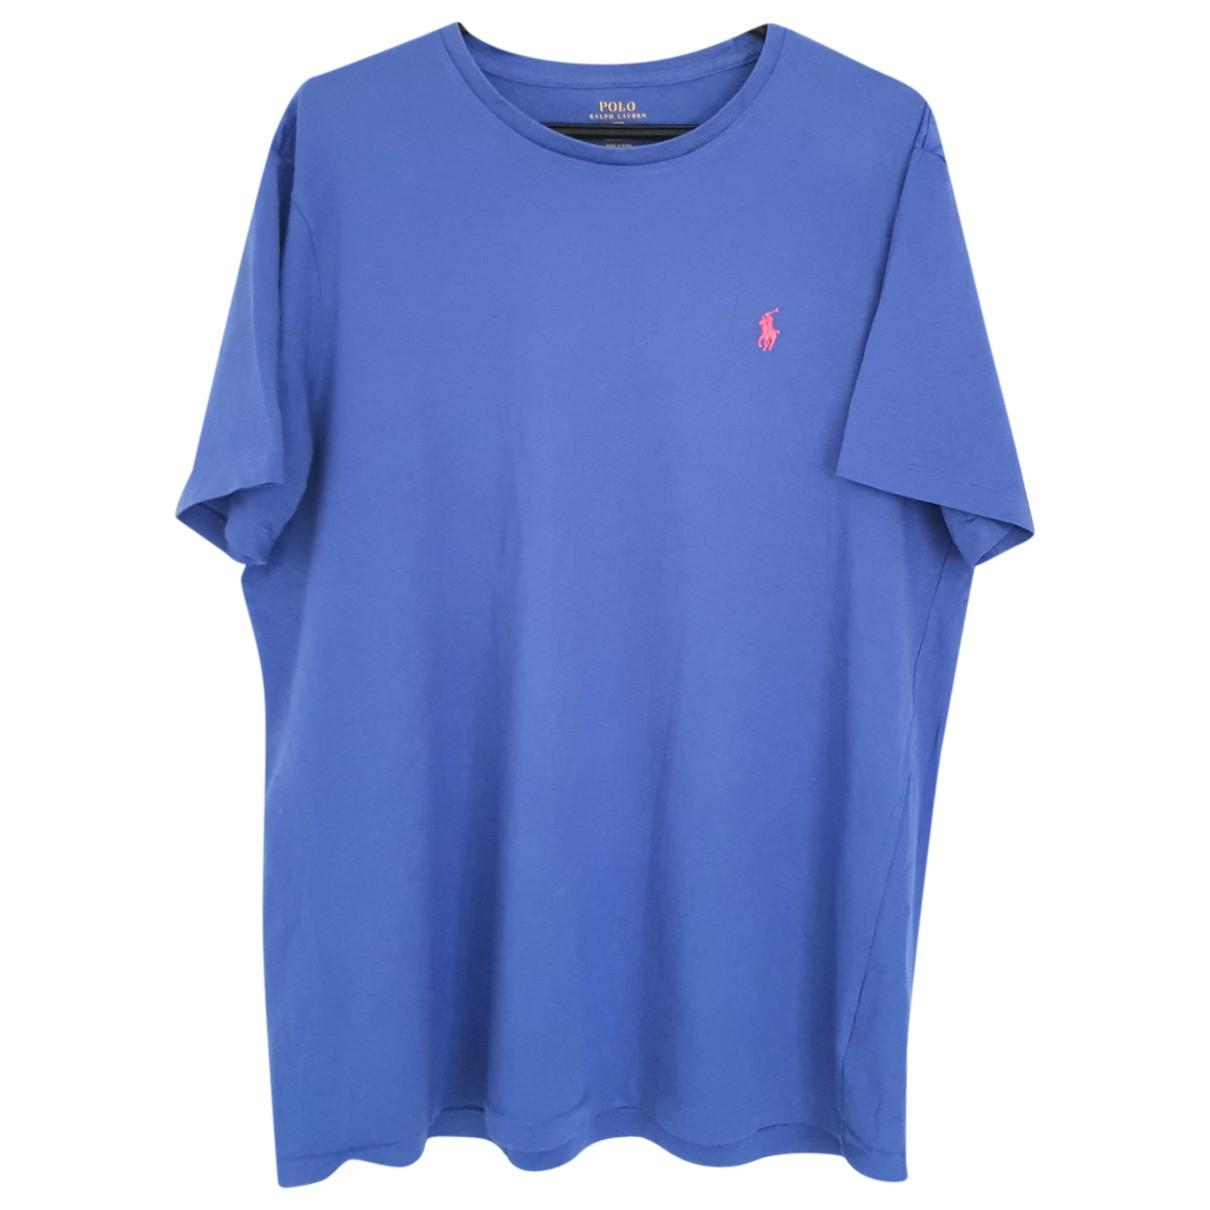 Polo Ralph Lauren \N Blue Cotton T-shirts for Men XL International